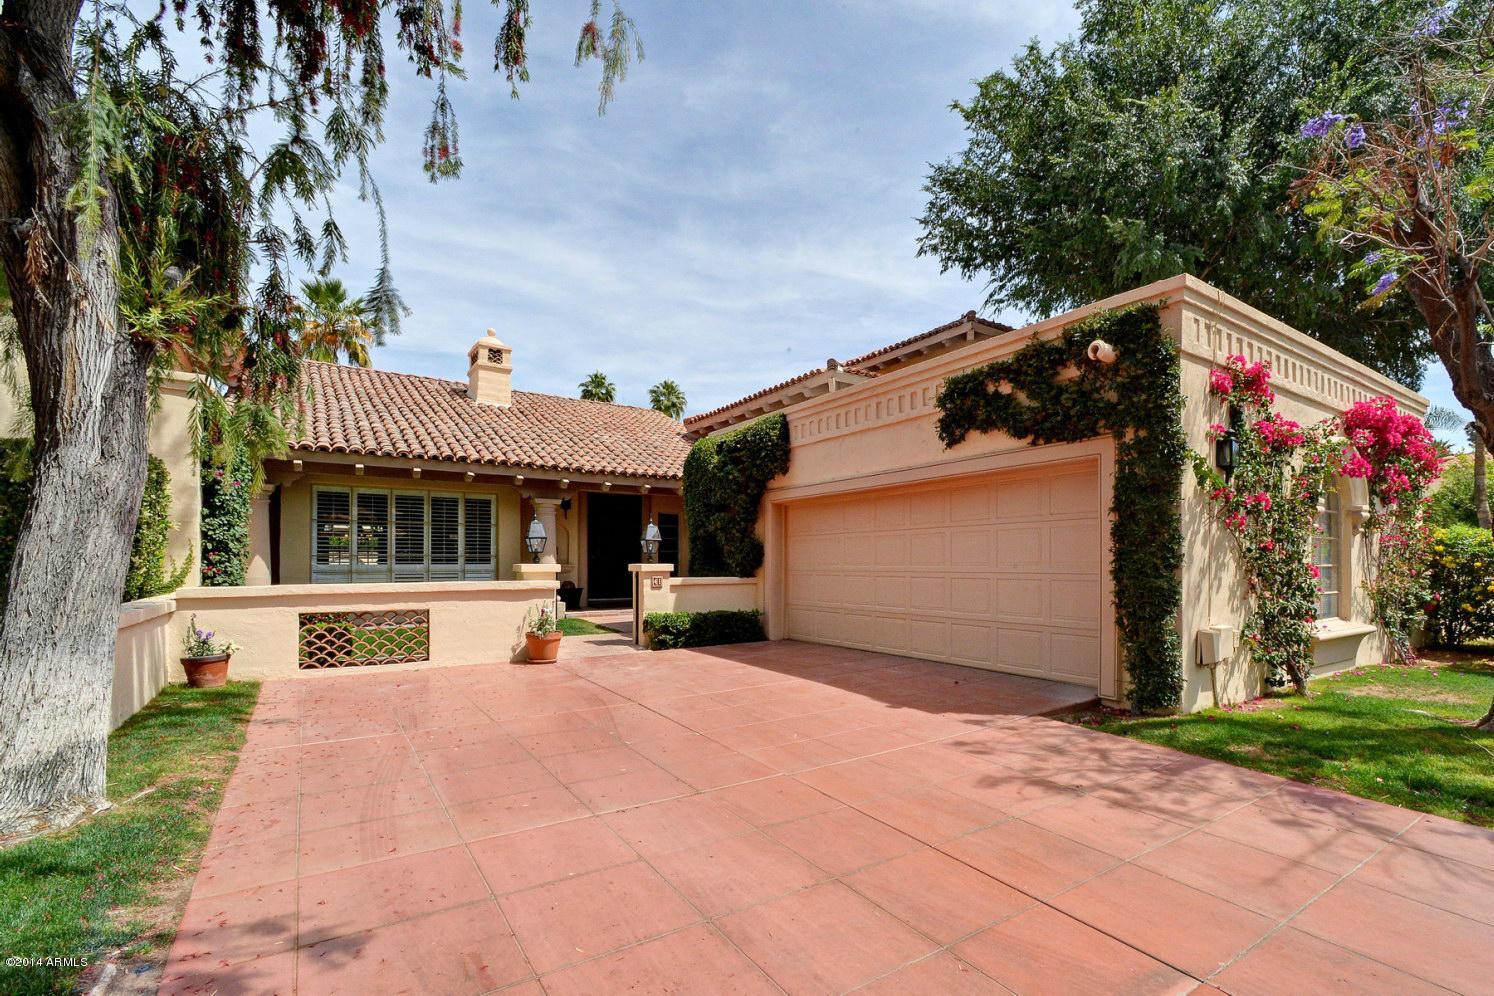 7500 E McCormick Pkwy 41, Scottsdale | $747,000